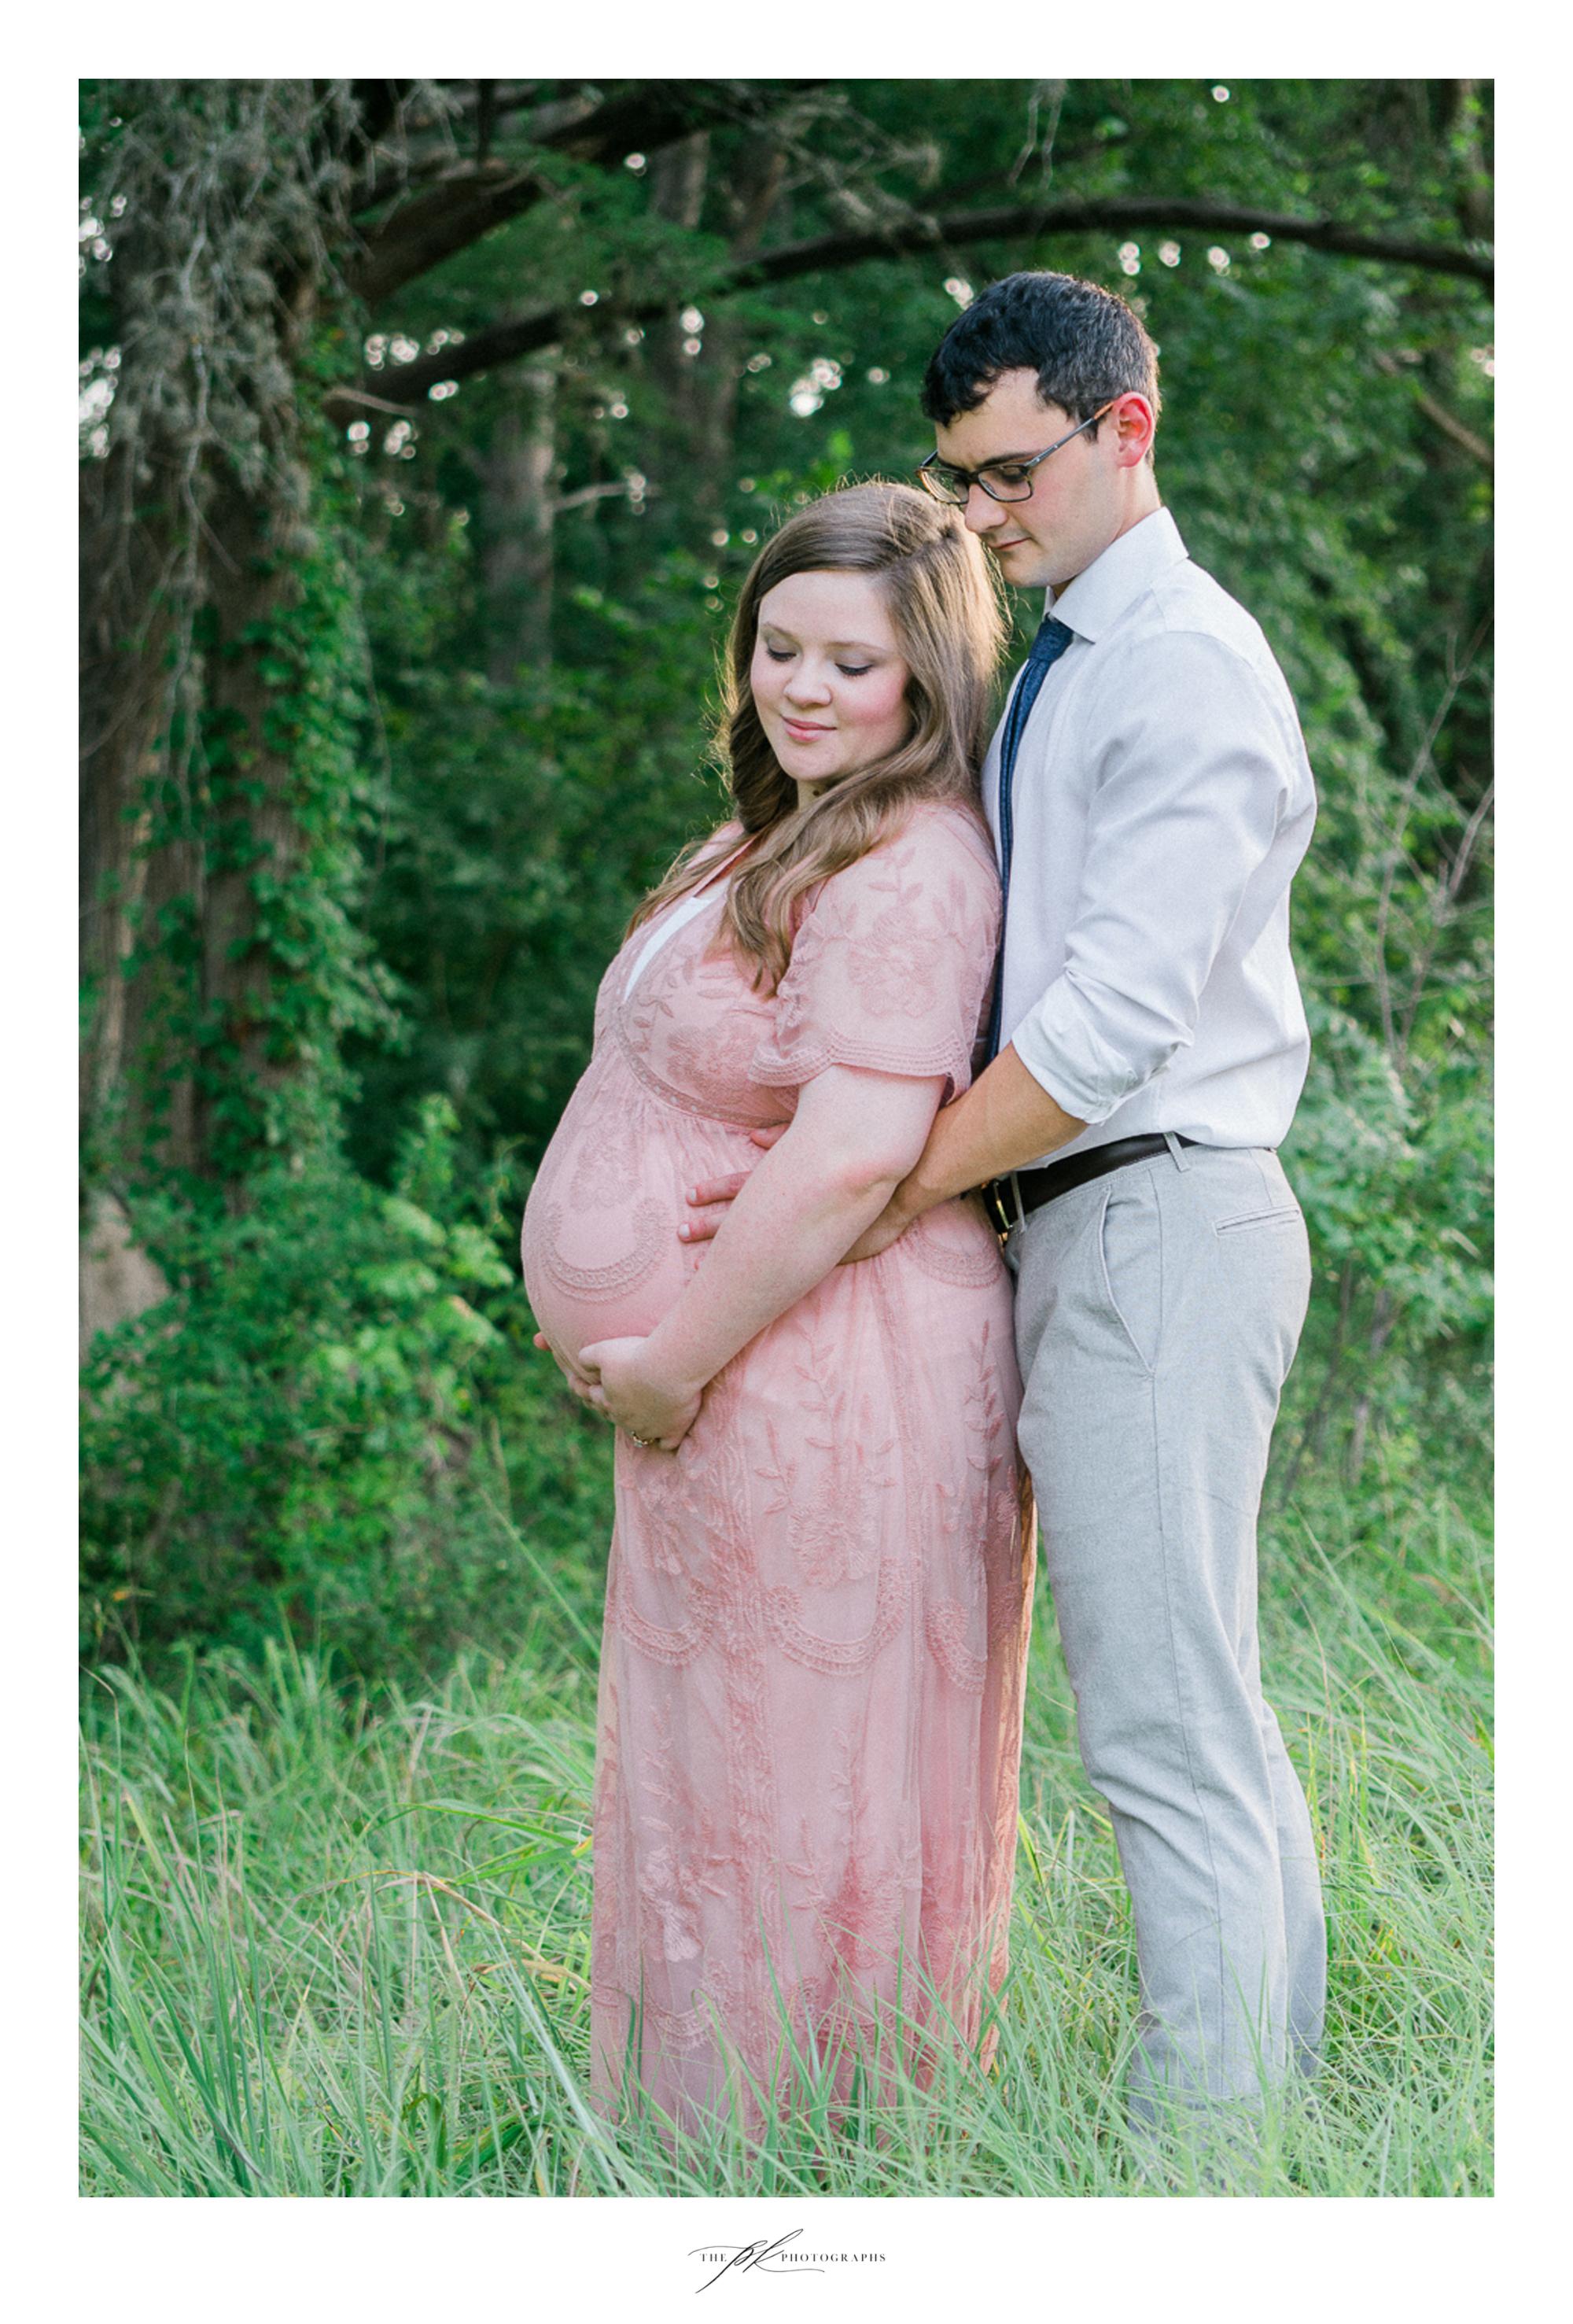 Maternity Portrait session near San Antonio, Texas.